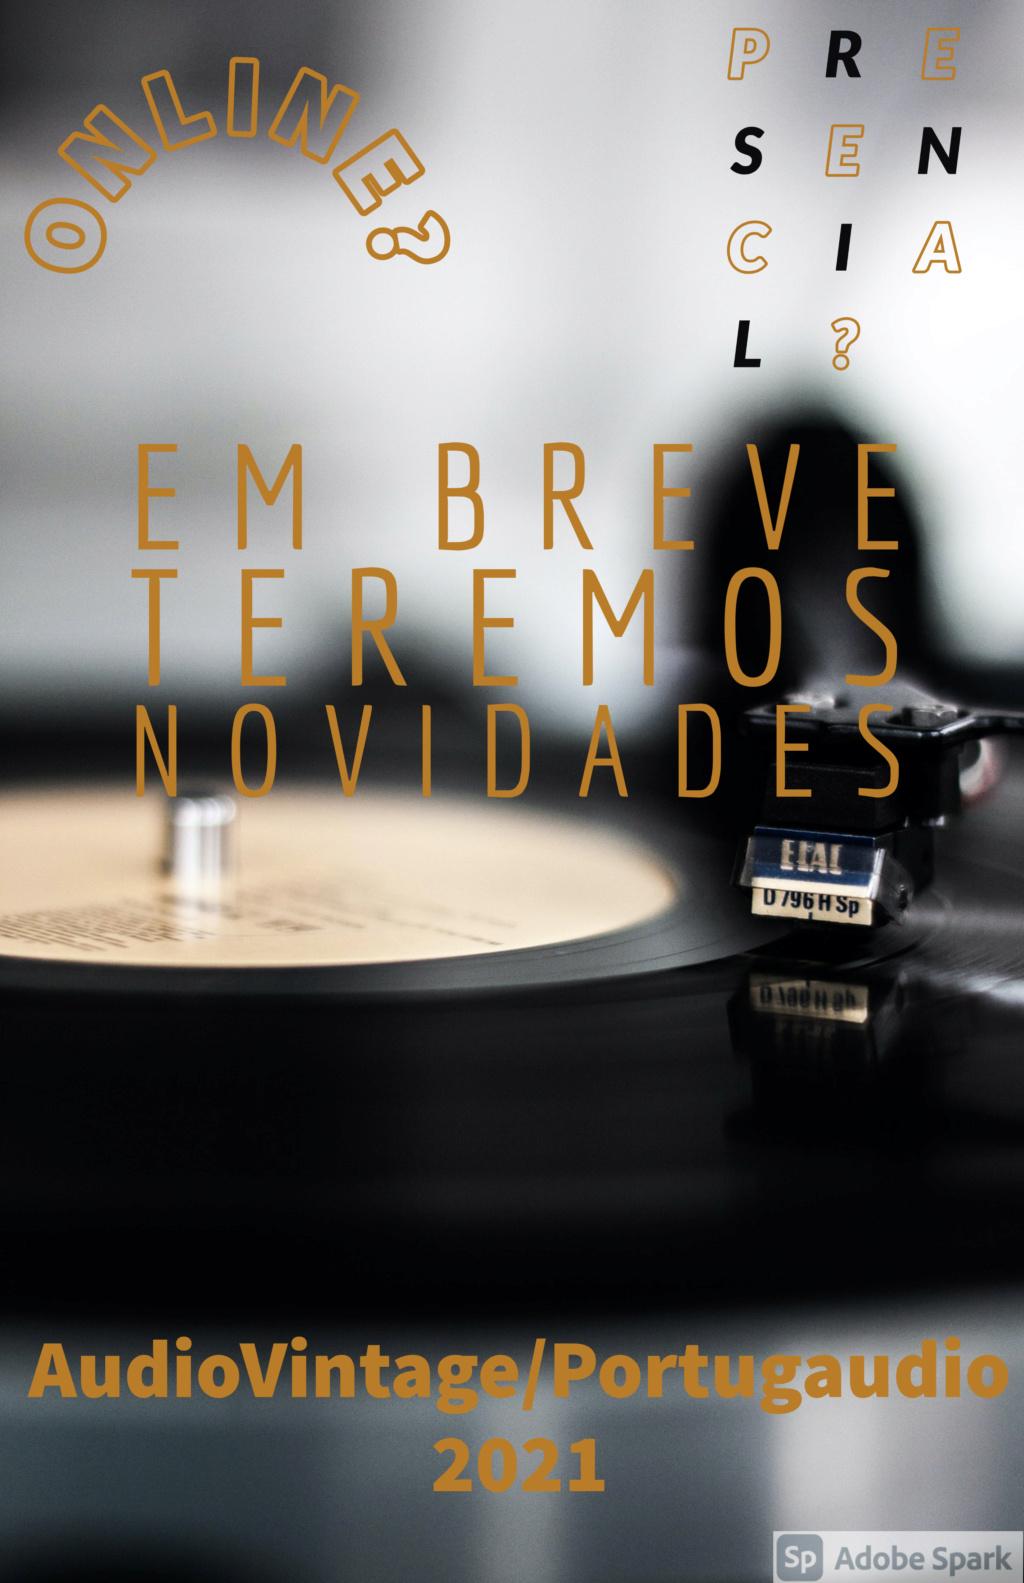 Audio Vintage /Portugaudio 2021 My_pos10